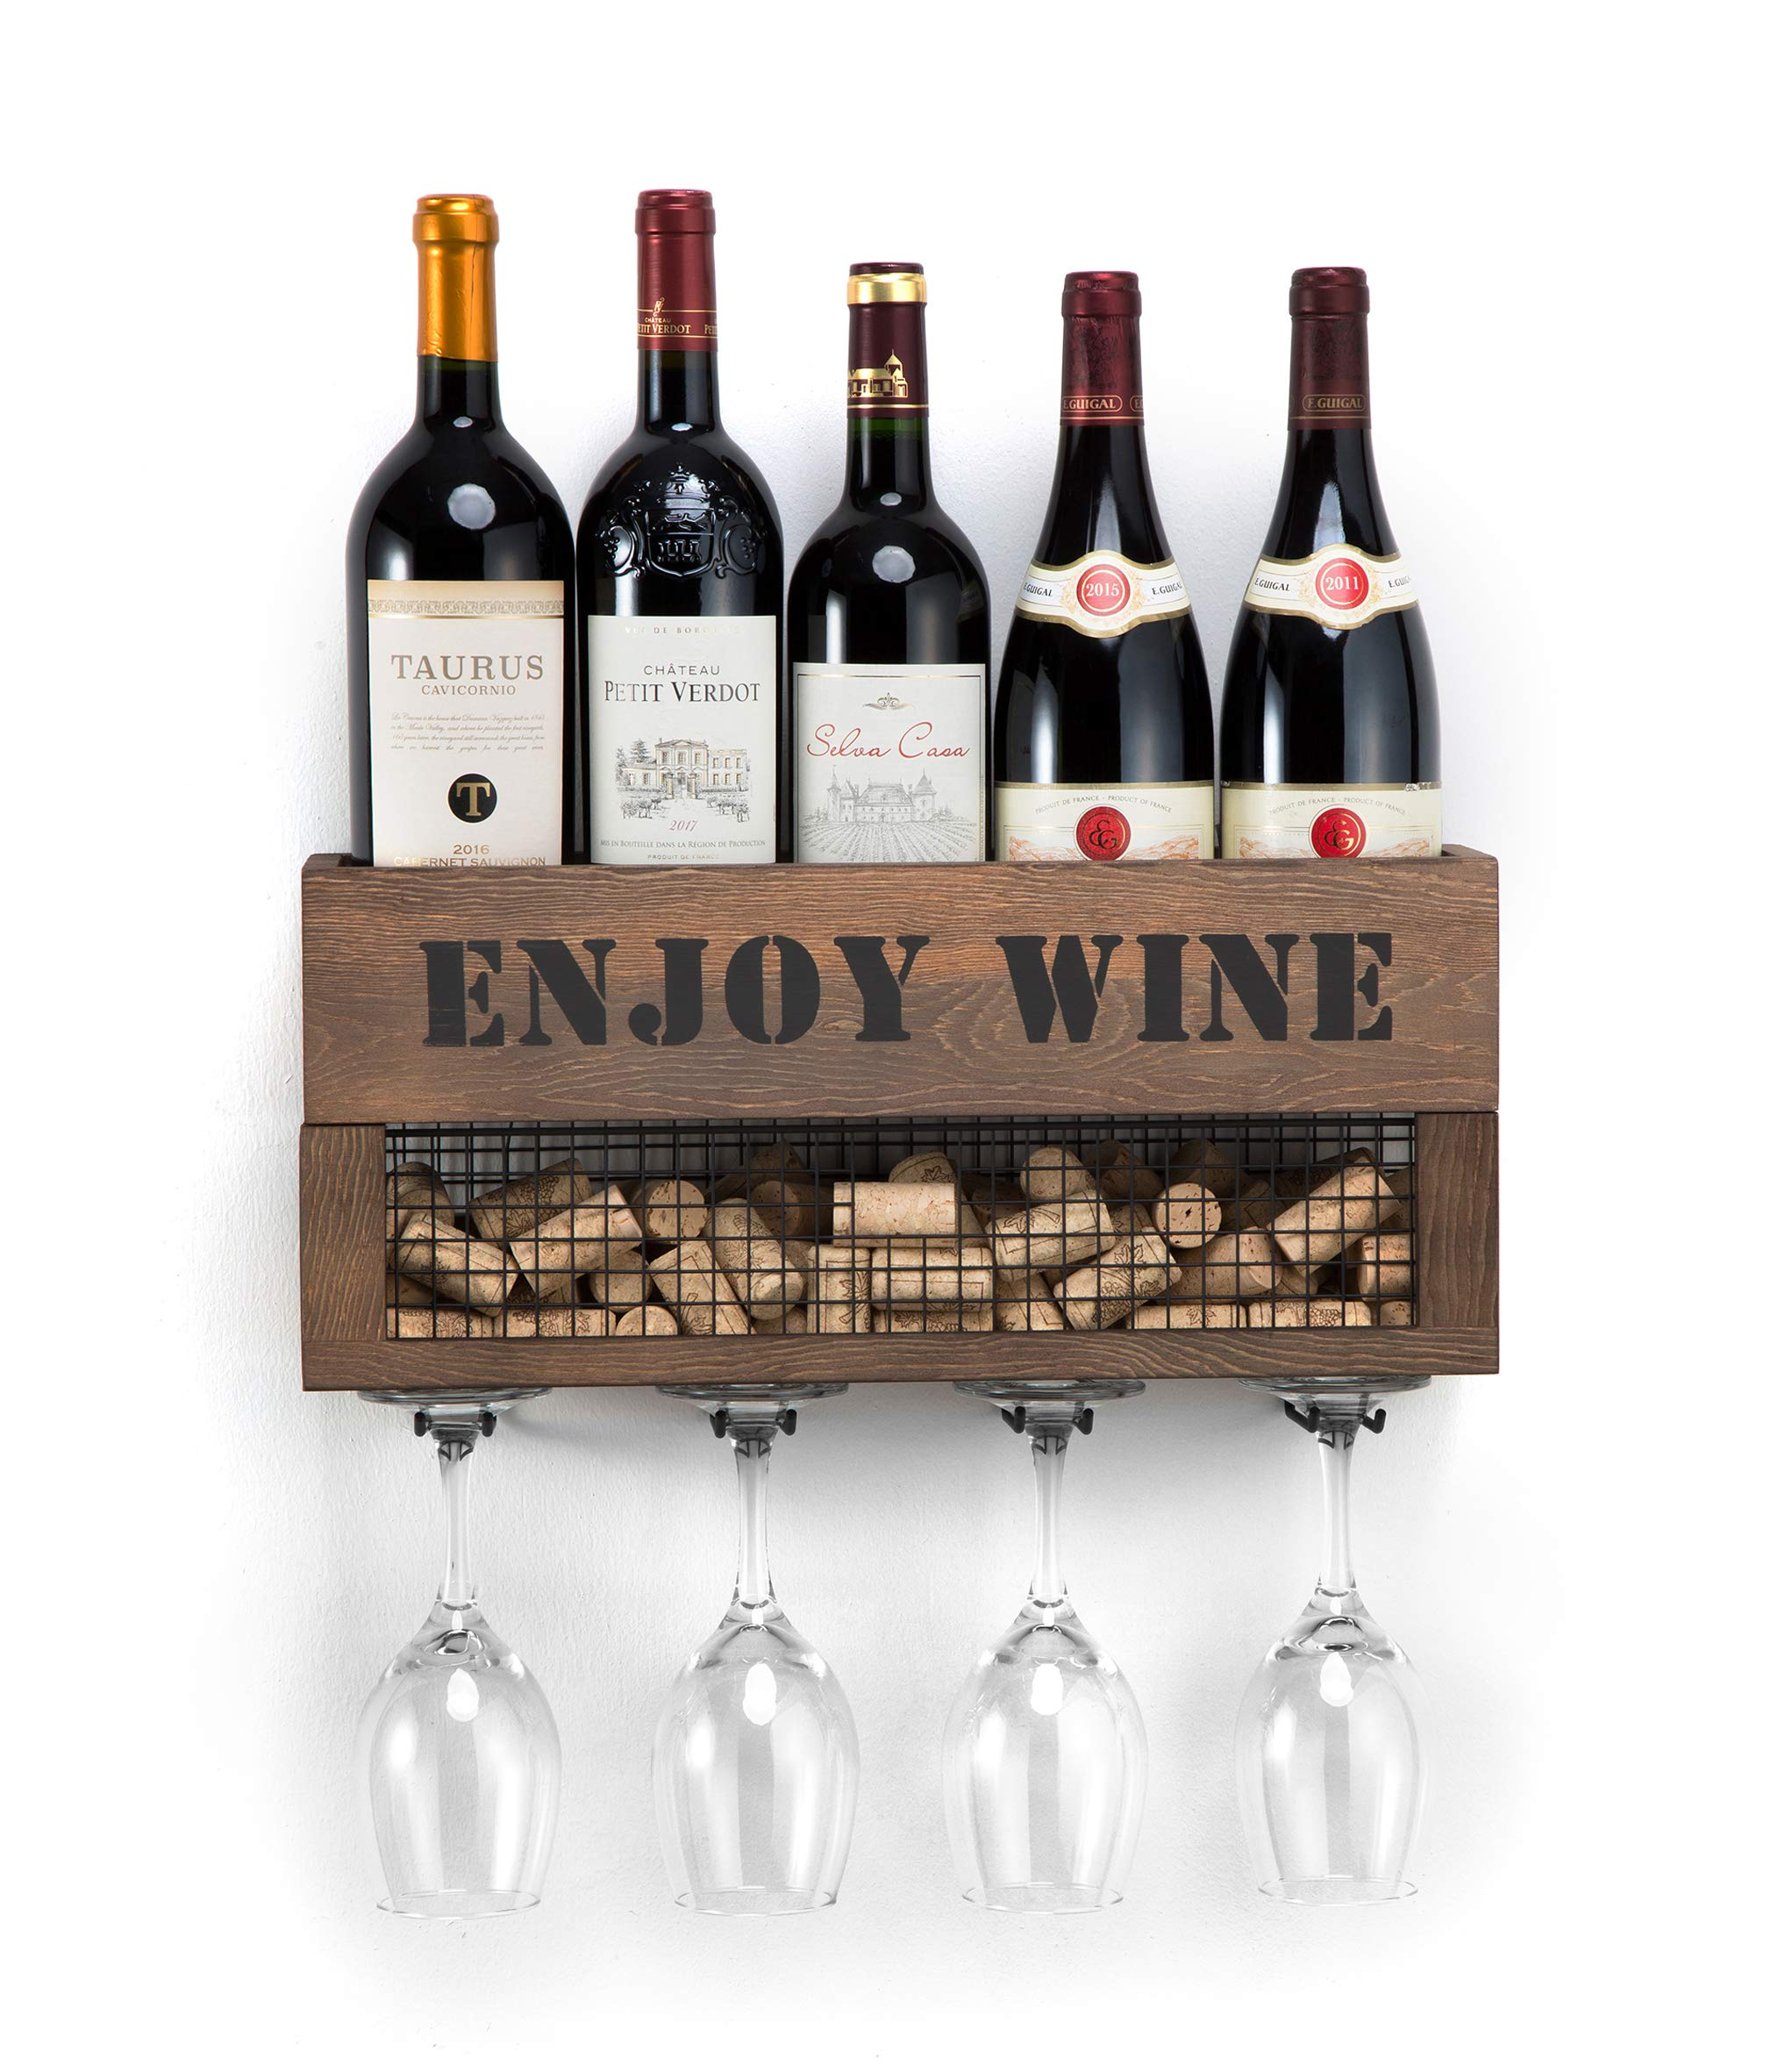 JACKCUBE Design Wall Mounted Metal and Wood Wine Rack Bottle & Glass Holder, Cork Storage Store for Kitchen, Dining Room, Bar, Wine Cellar : MK450A by J JACKCUBE DESIGN